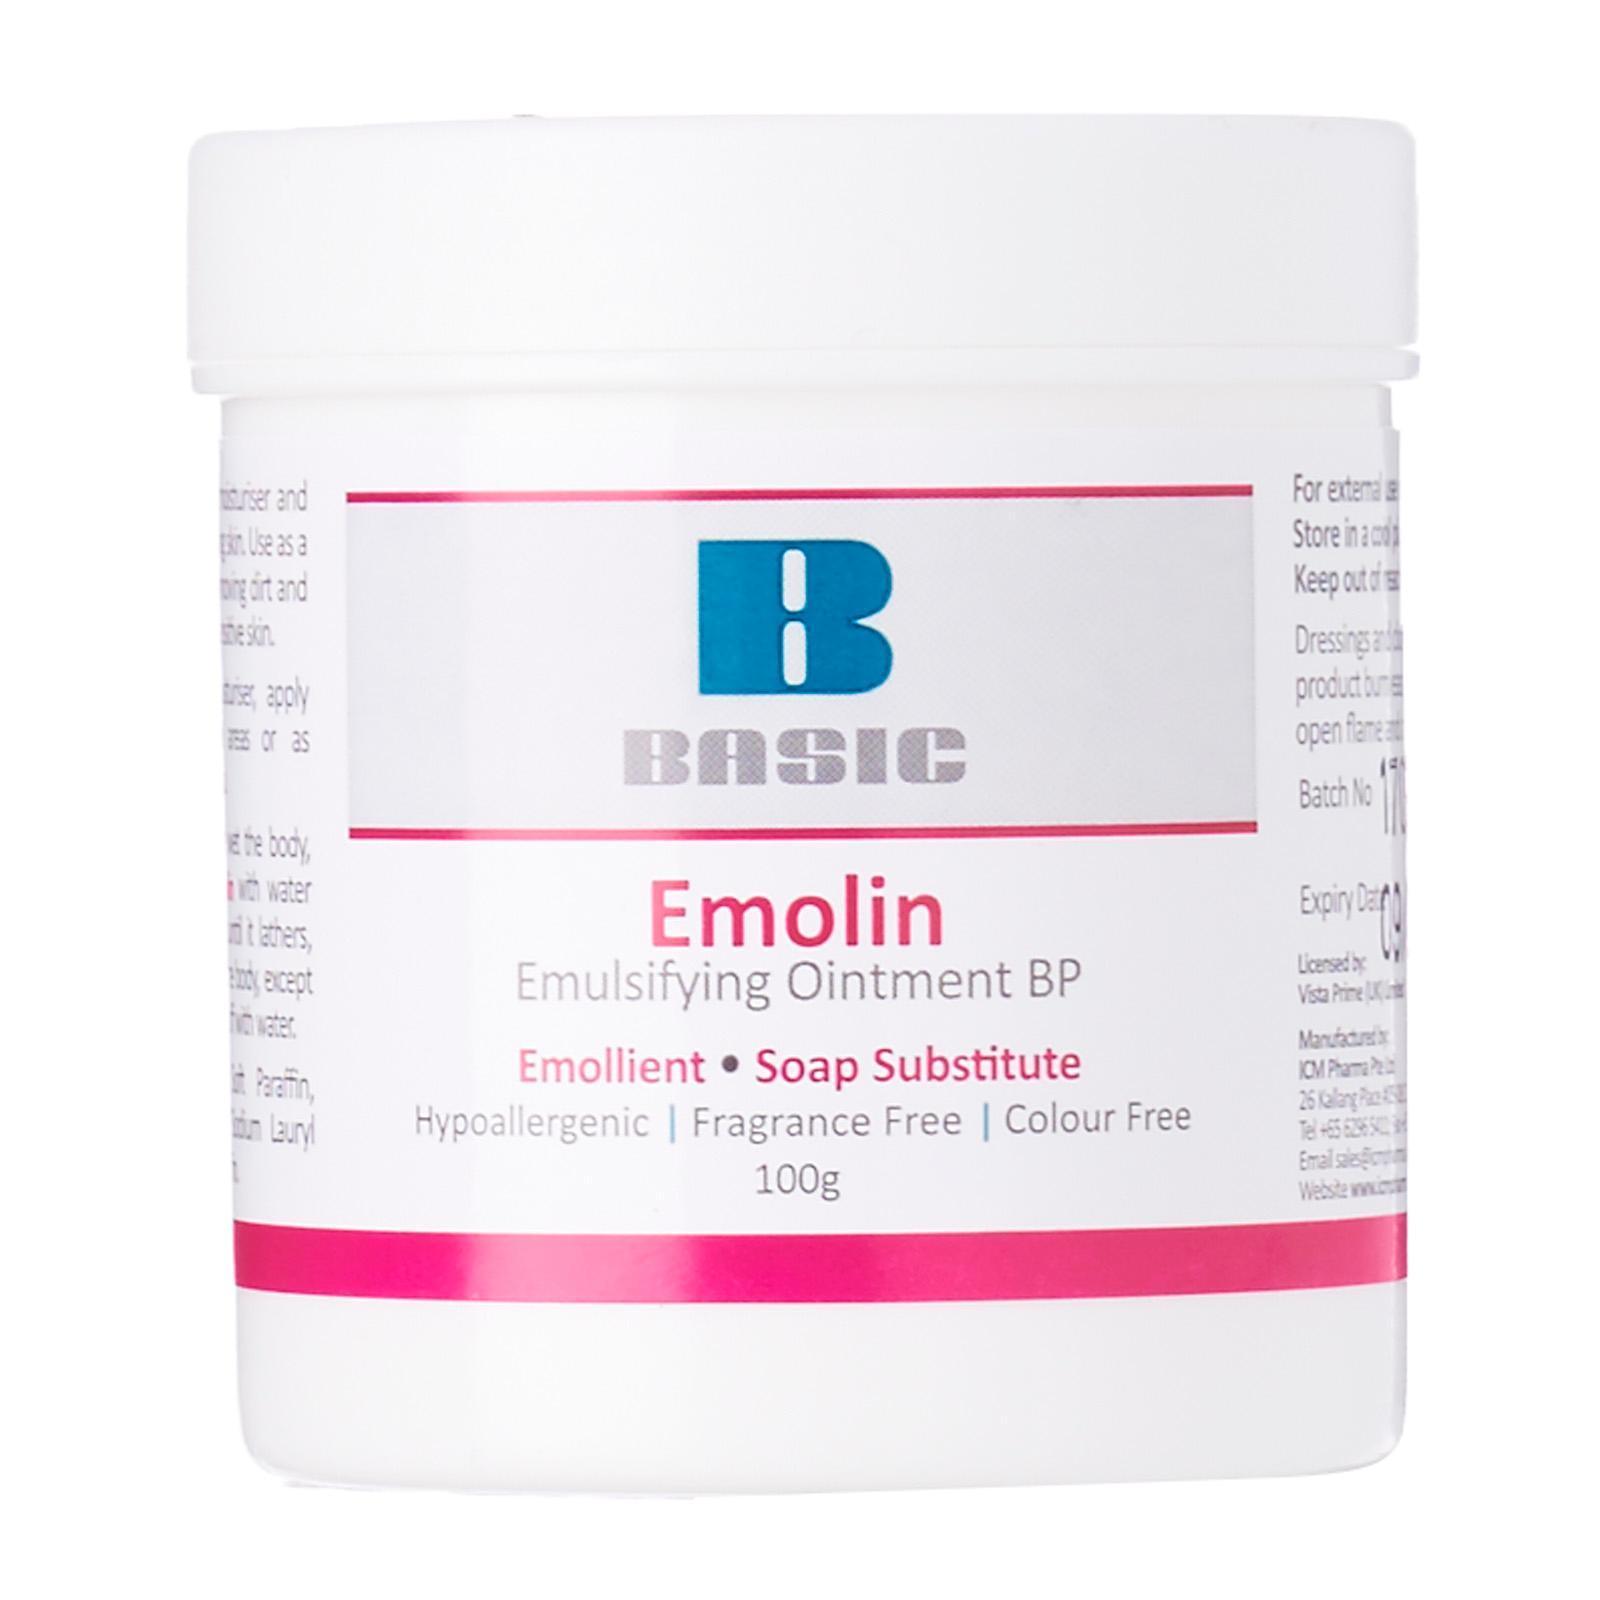 ICM Pharma Basic Emolin (Emulsifying Ointment BP) - By Medic Drugstore